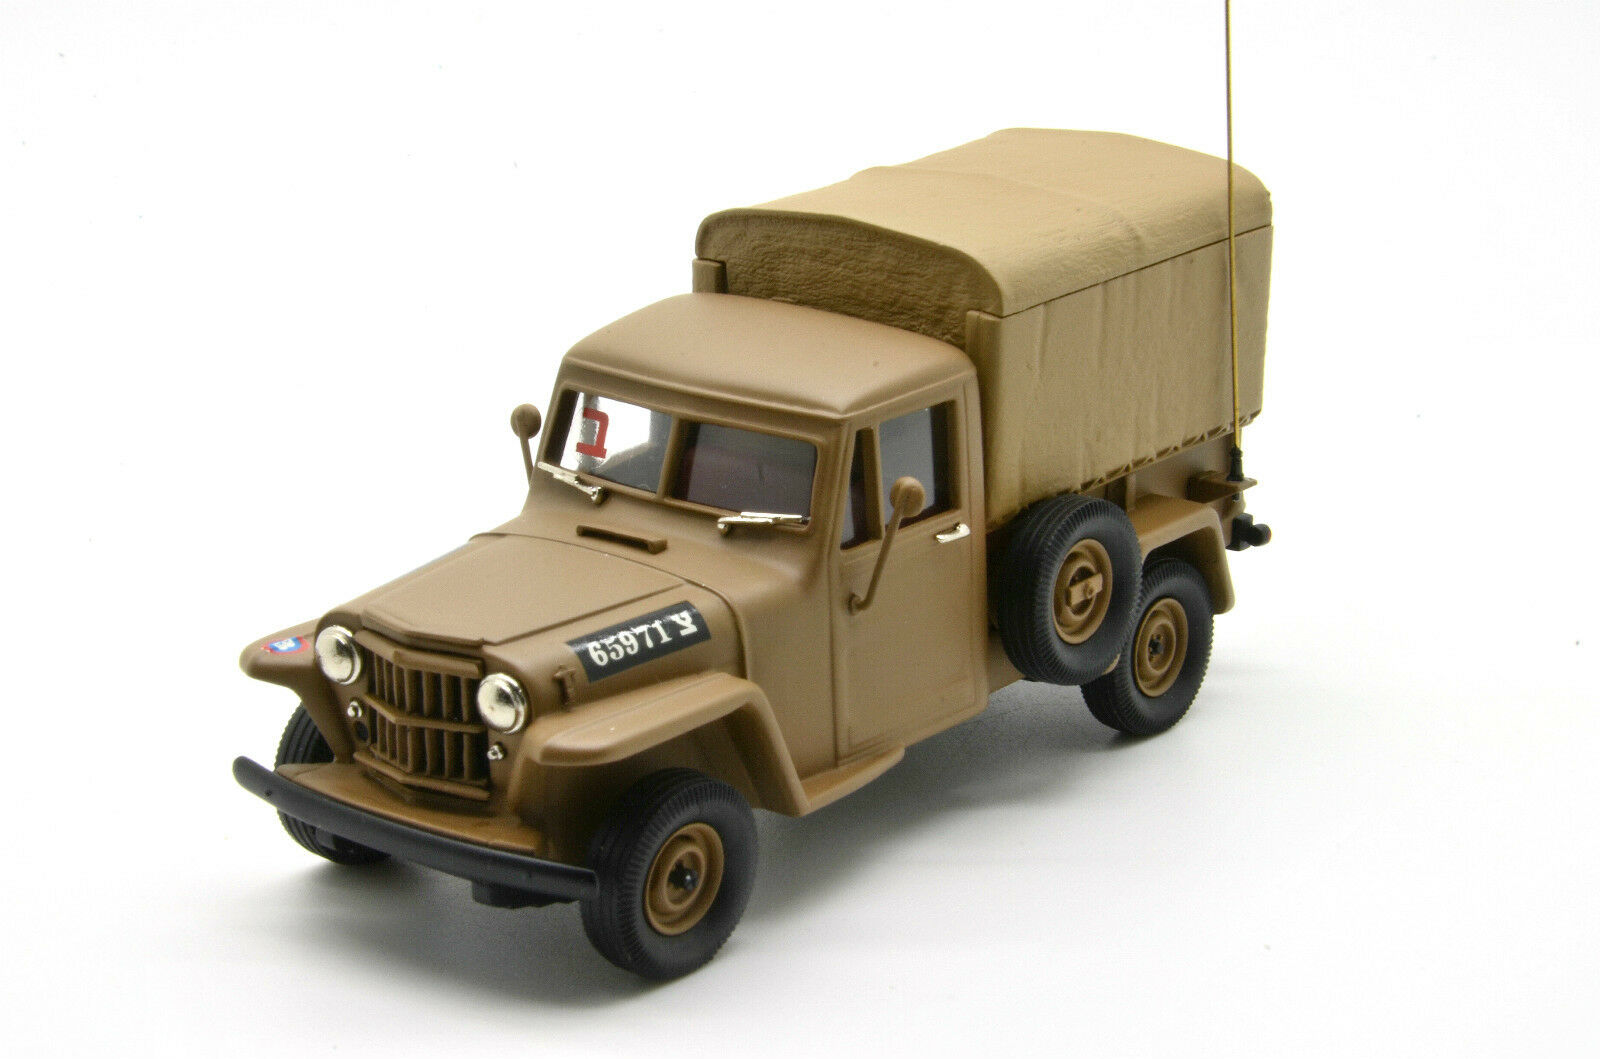 rara    Willys Pick-up 1956 BRK. ISR 03 Ejército De Israel Brooklin 1 43 Lim. 100 piezas